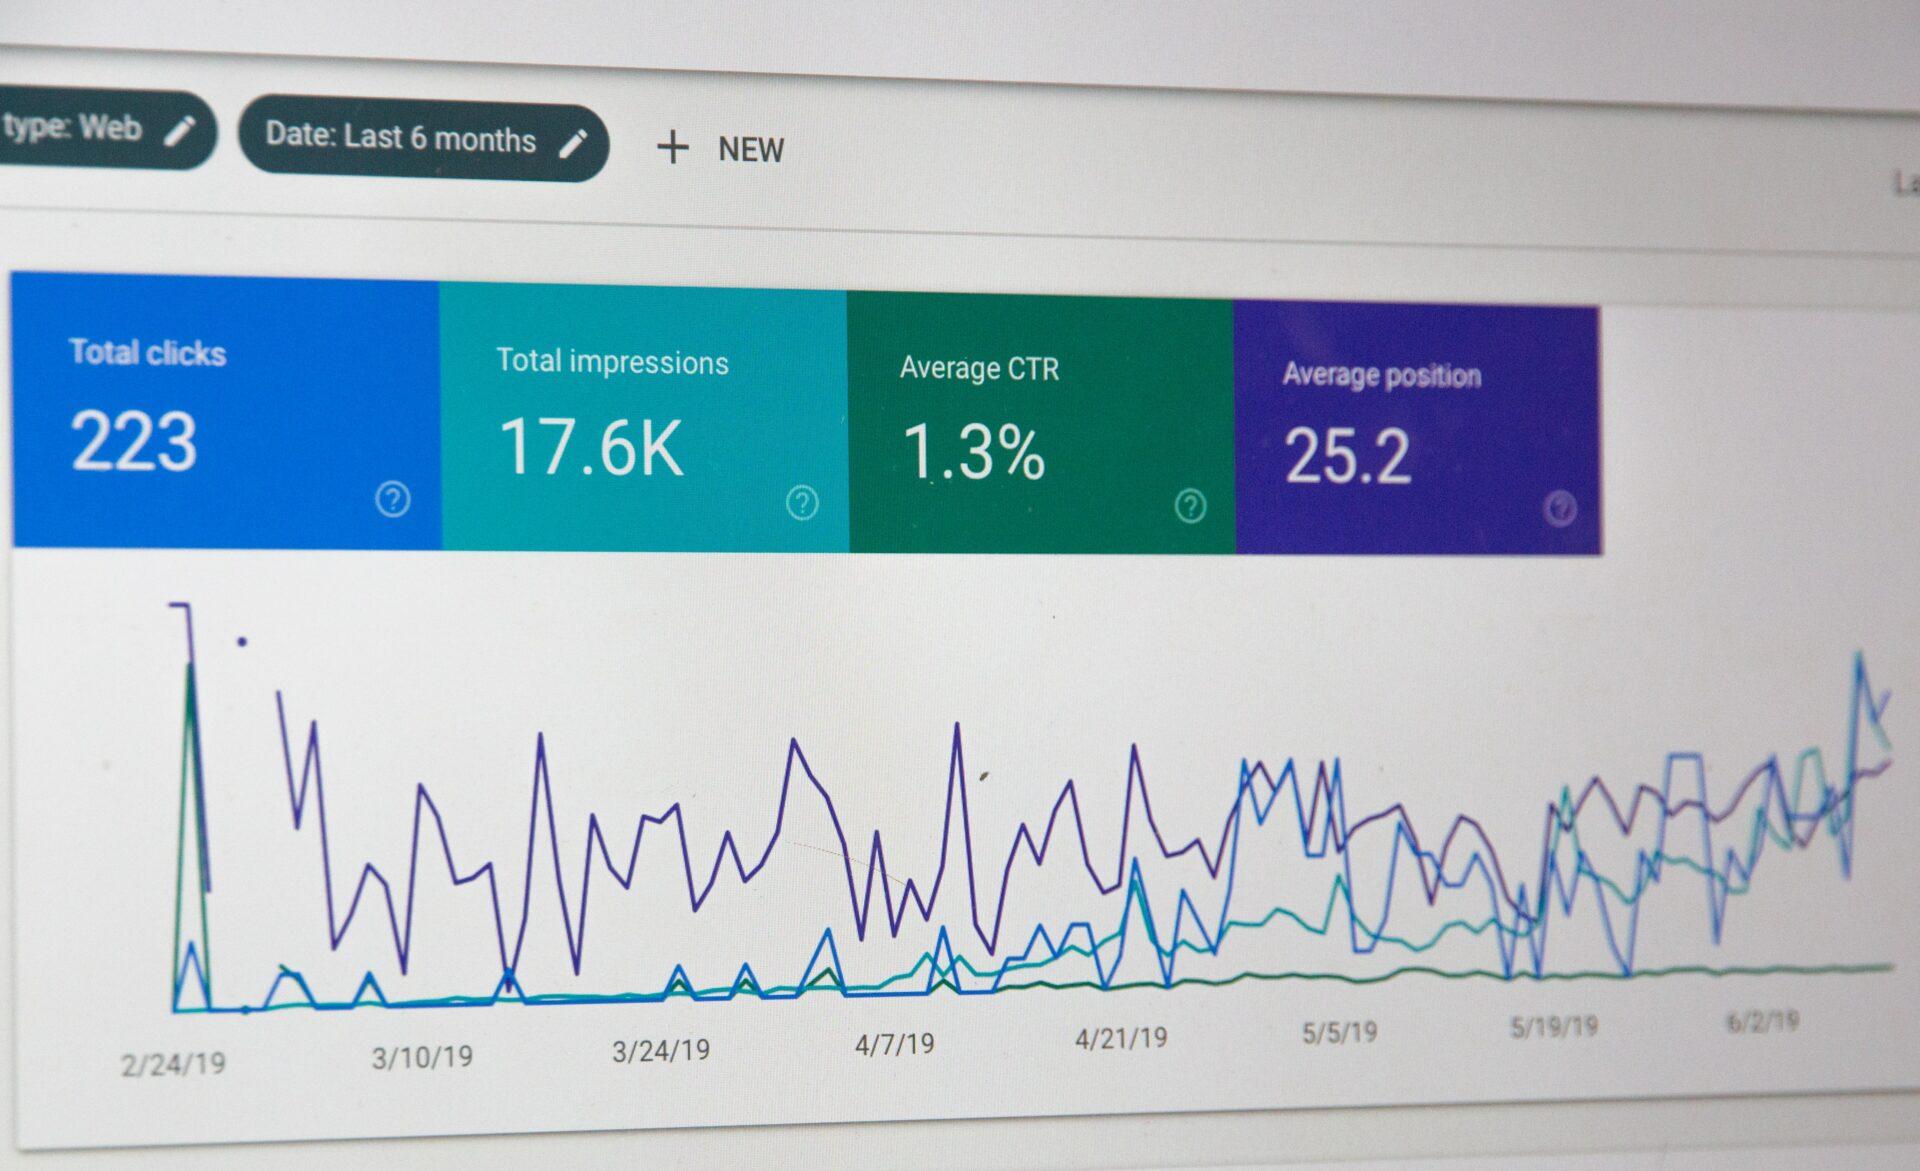 Image of Google Search Console data measuring SEO data.